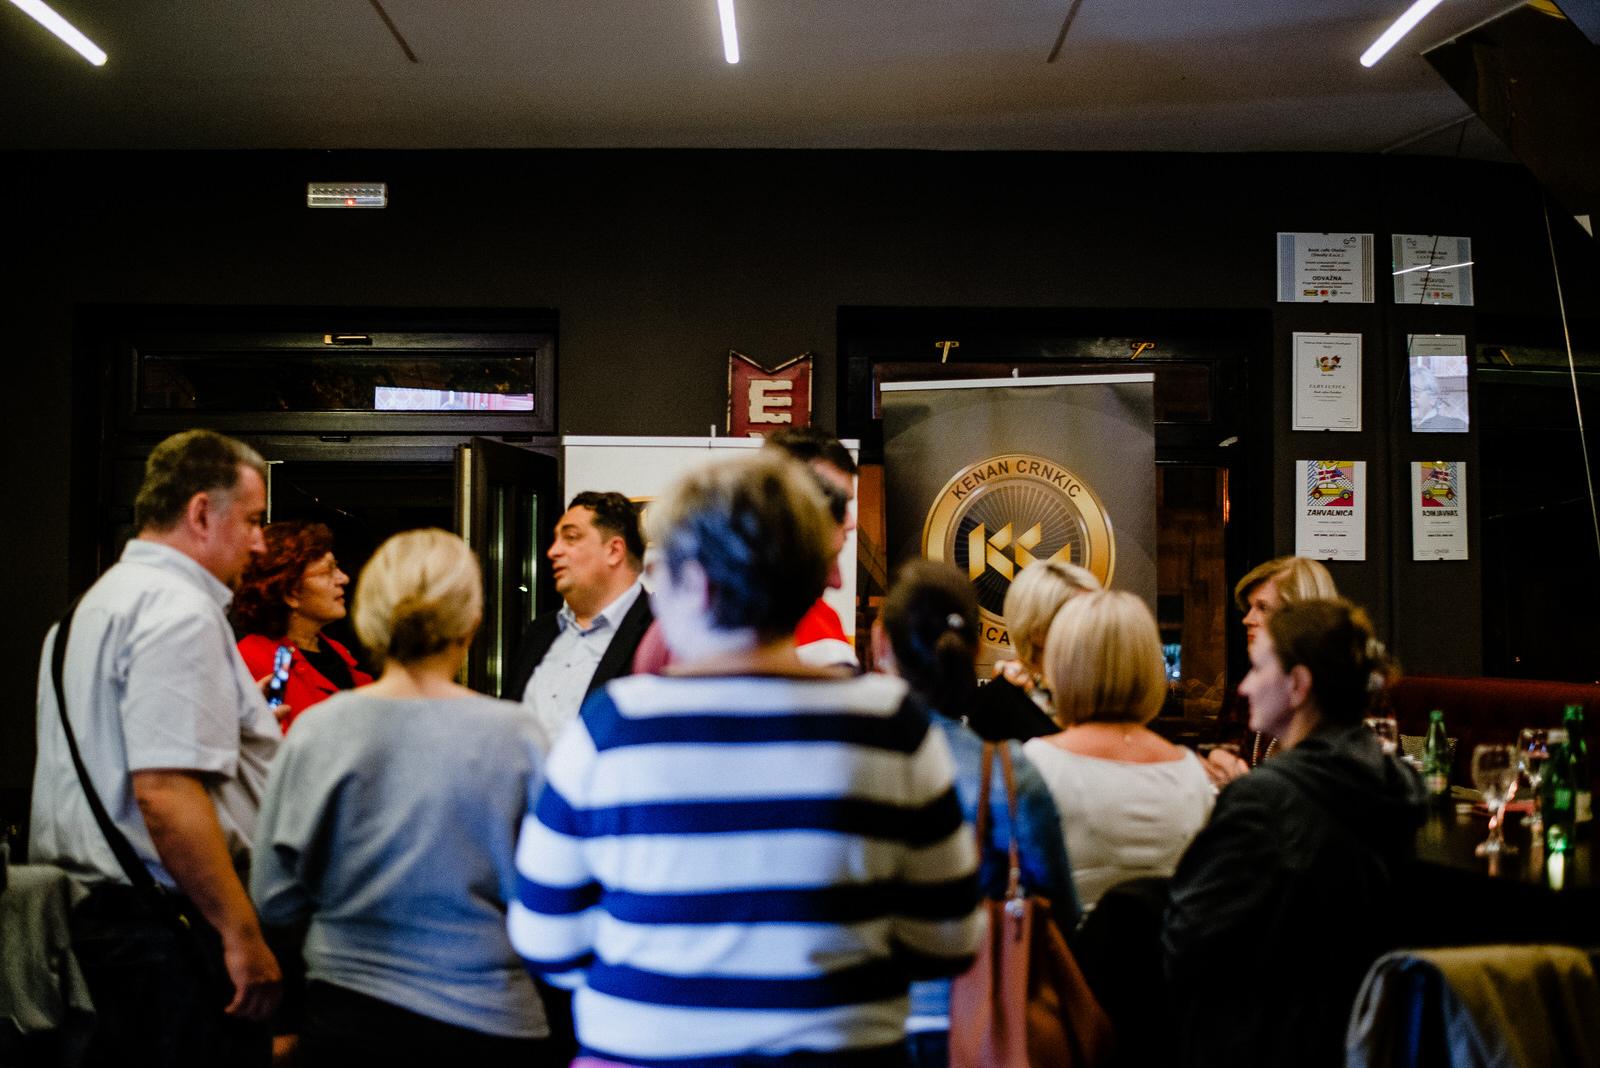 likaclub_otočac_book-caffe-paradisso_kenan-crnkić_2019-23